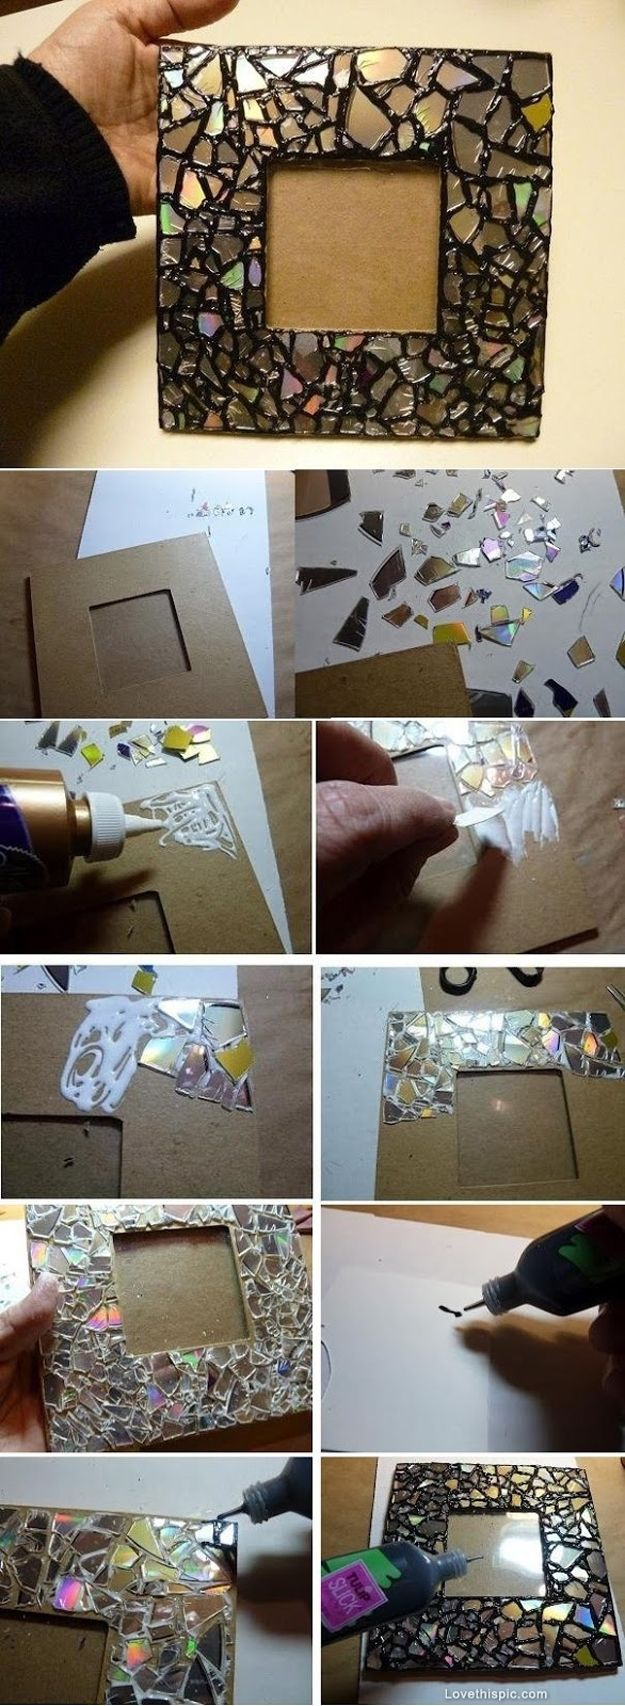 Cheap DIY Collage Photo Frame Art   http://diyready.com/diy-photo-frames-to-keep-your-memories-near-and-dear/